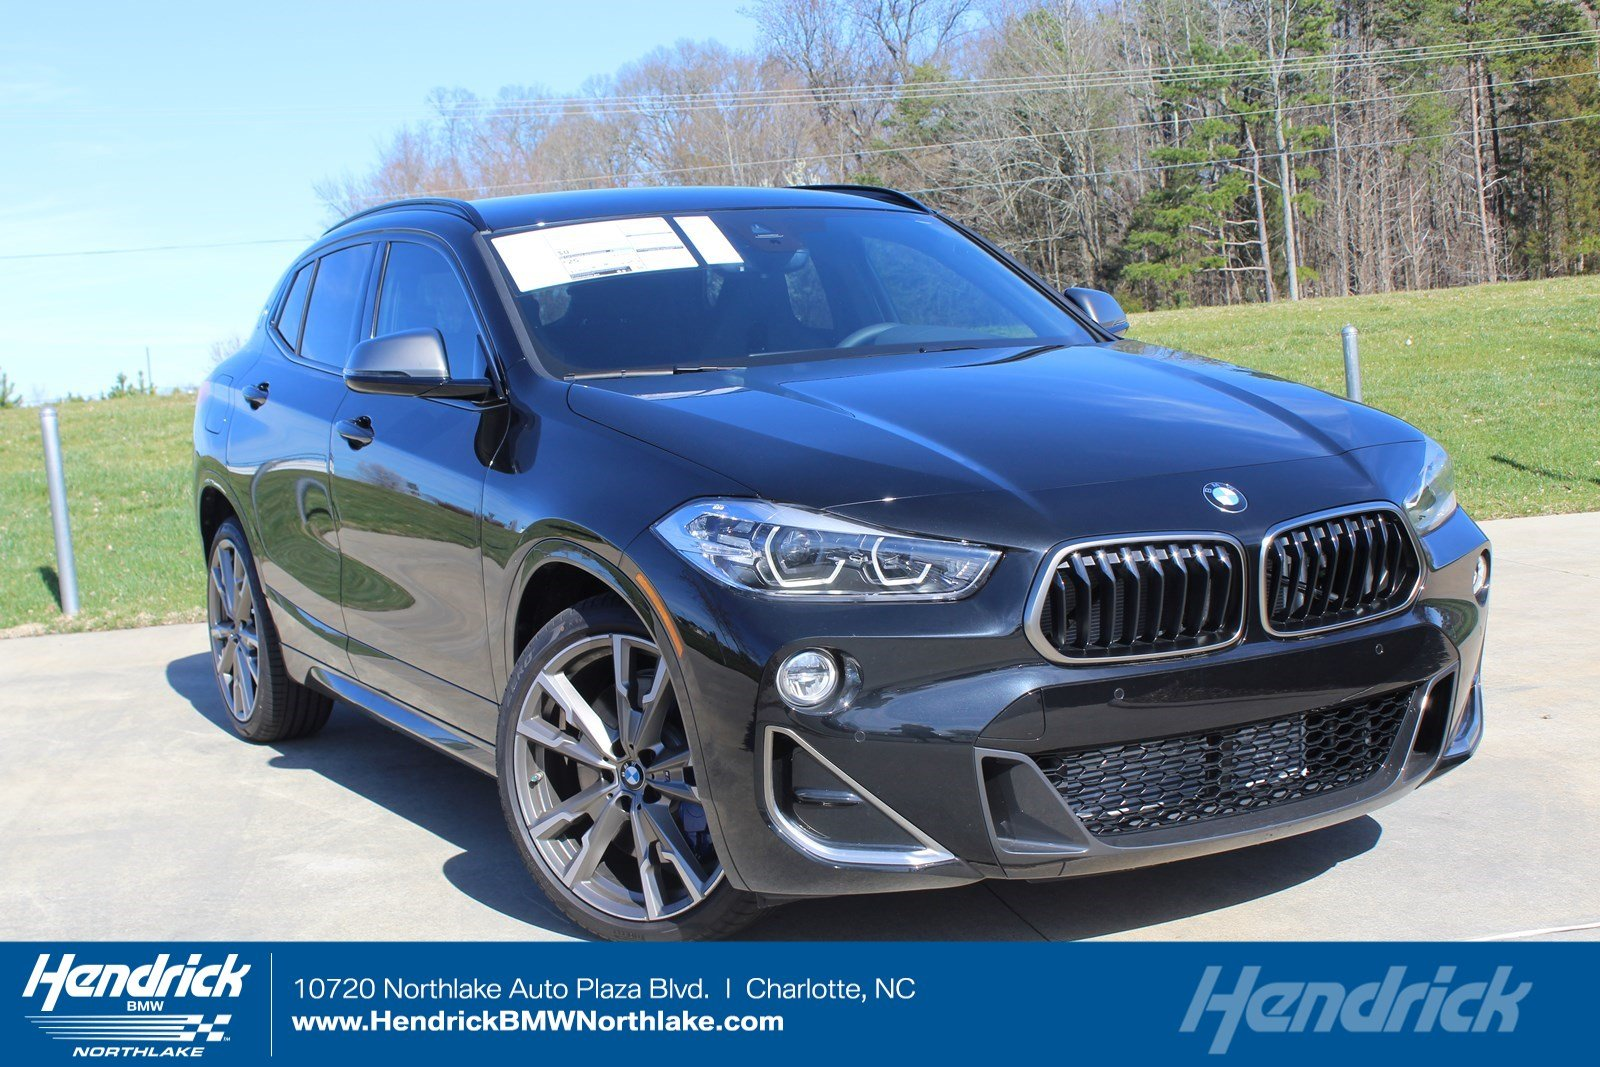 2019 BMW X2 M35i SUV